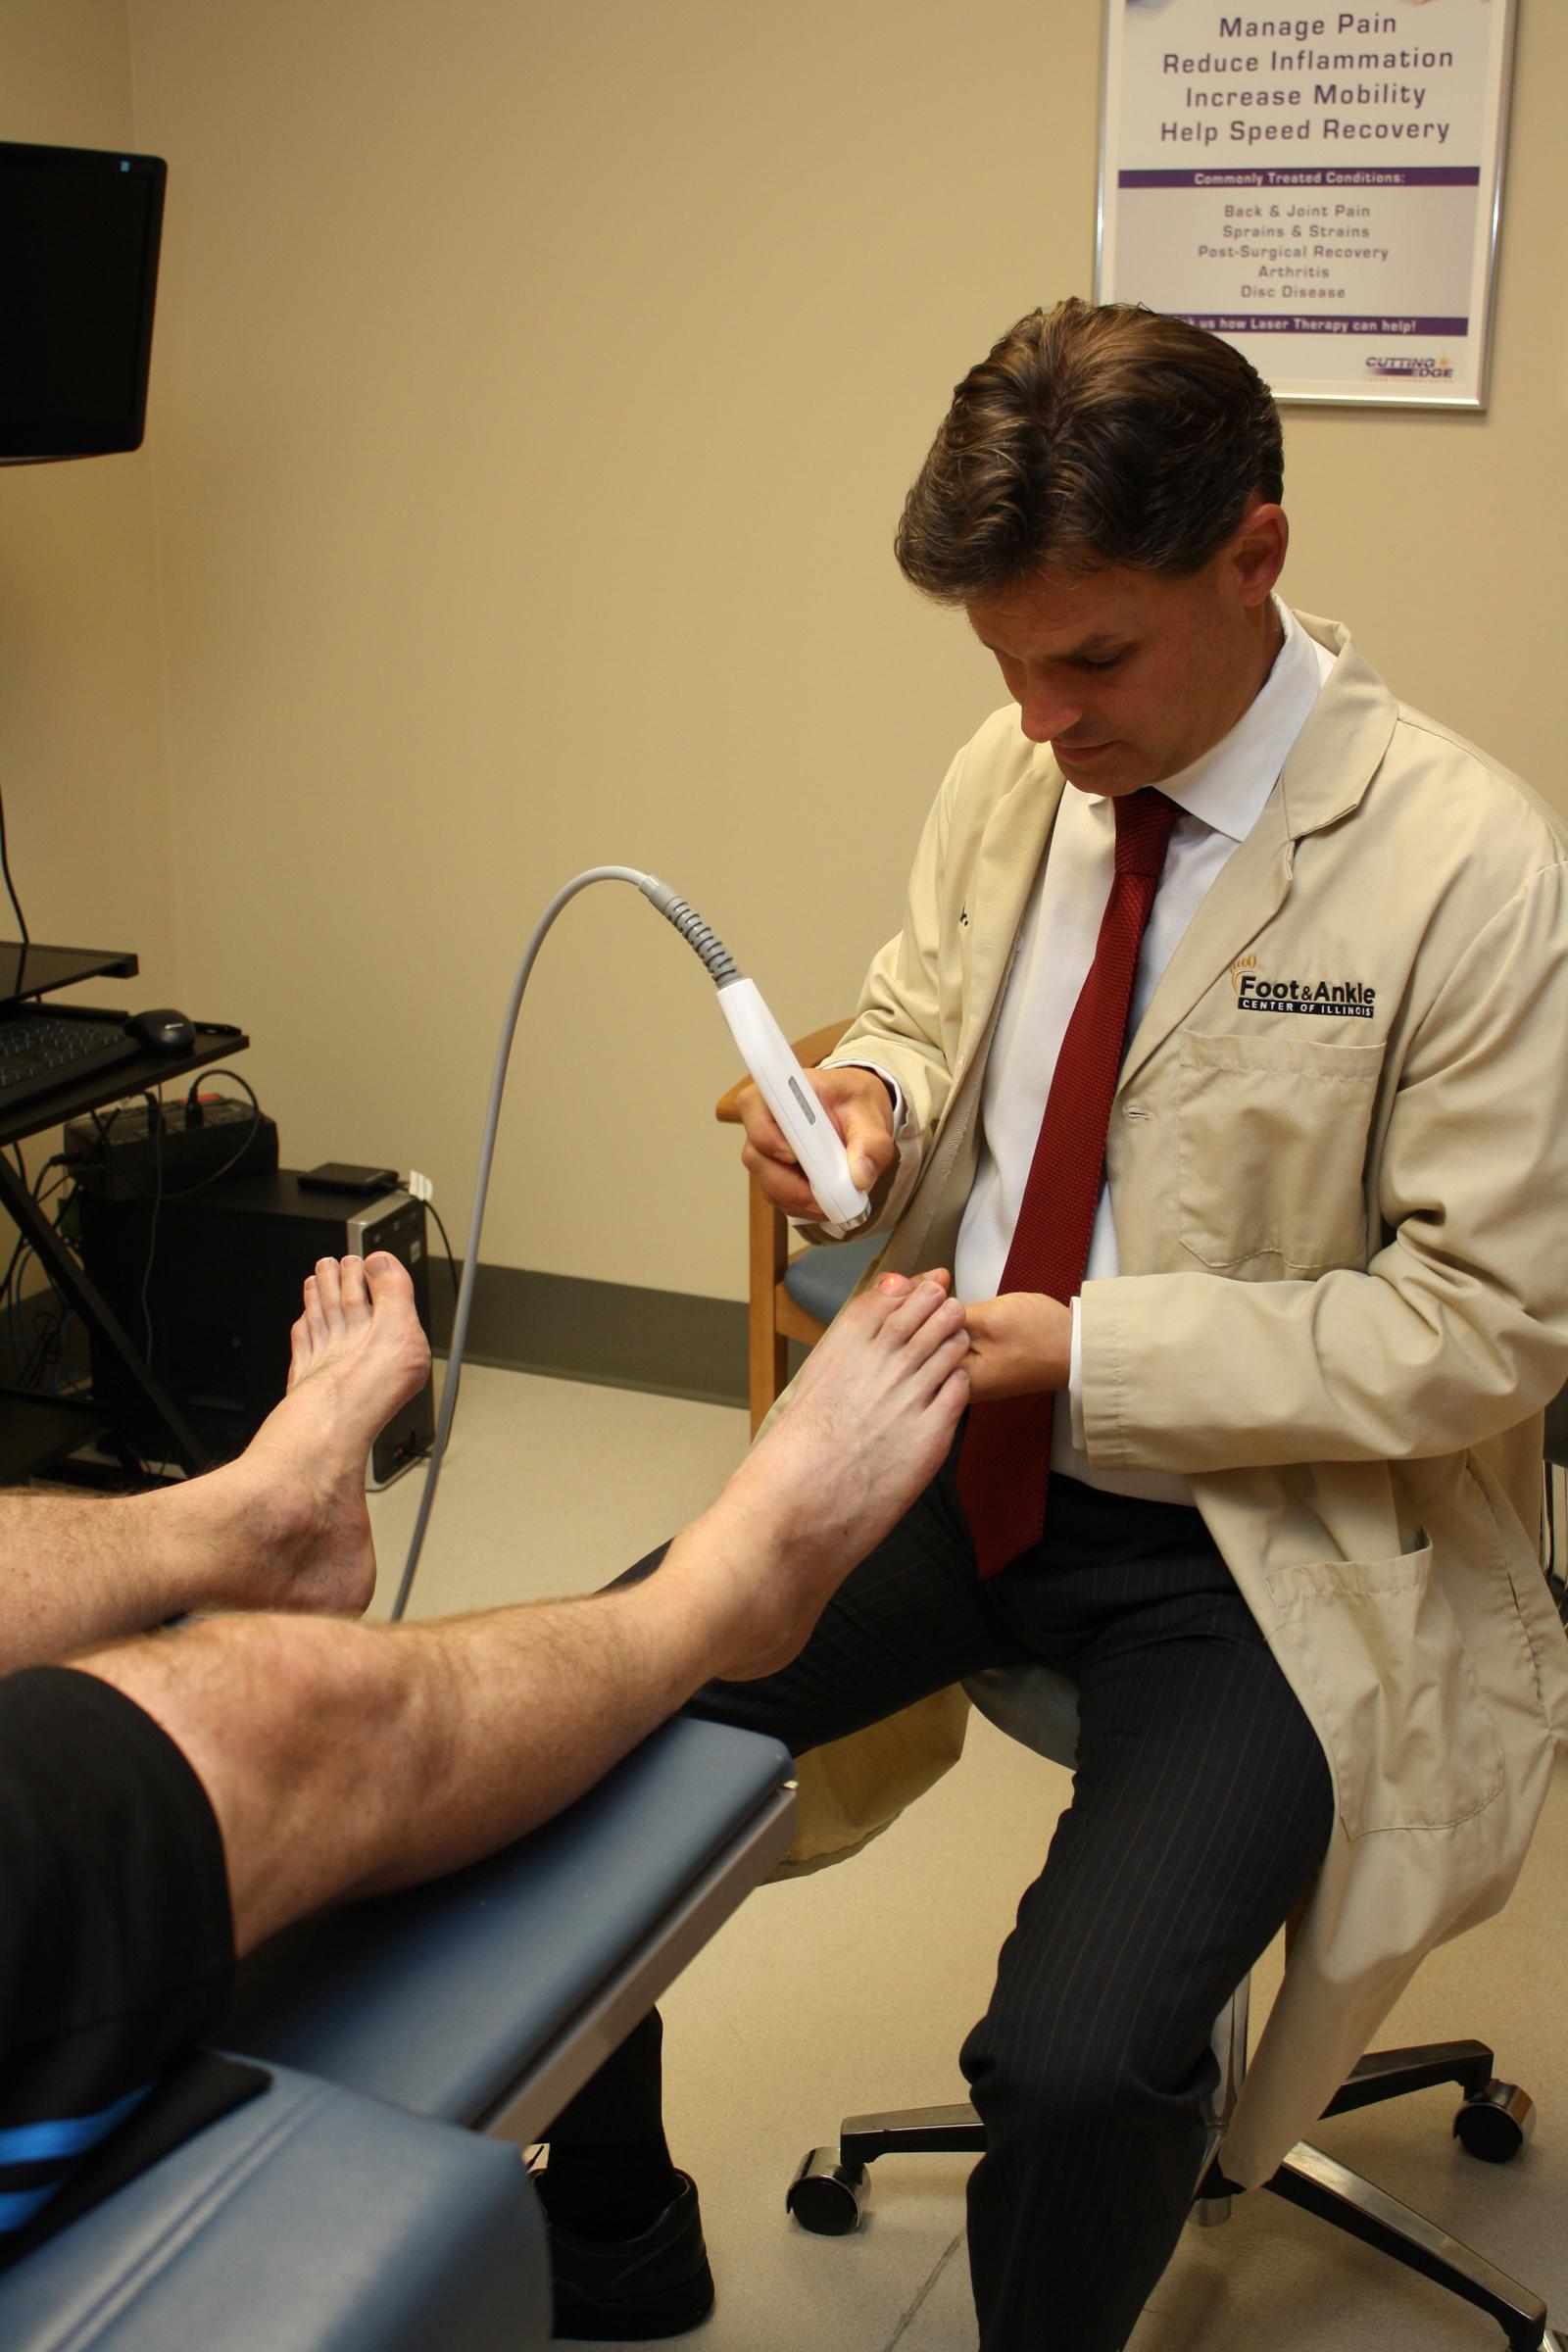 Dr Sigle Laser Photo